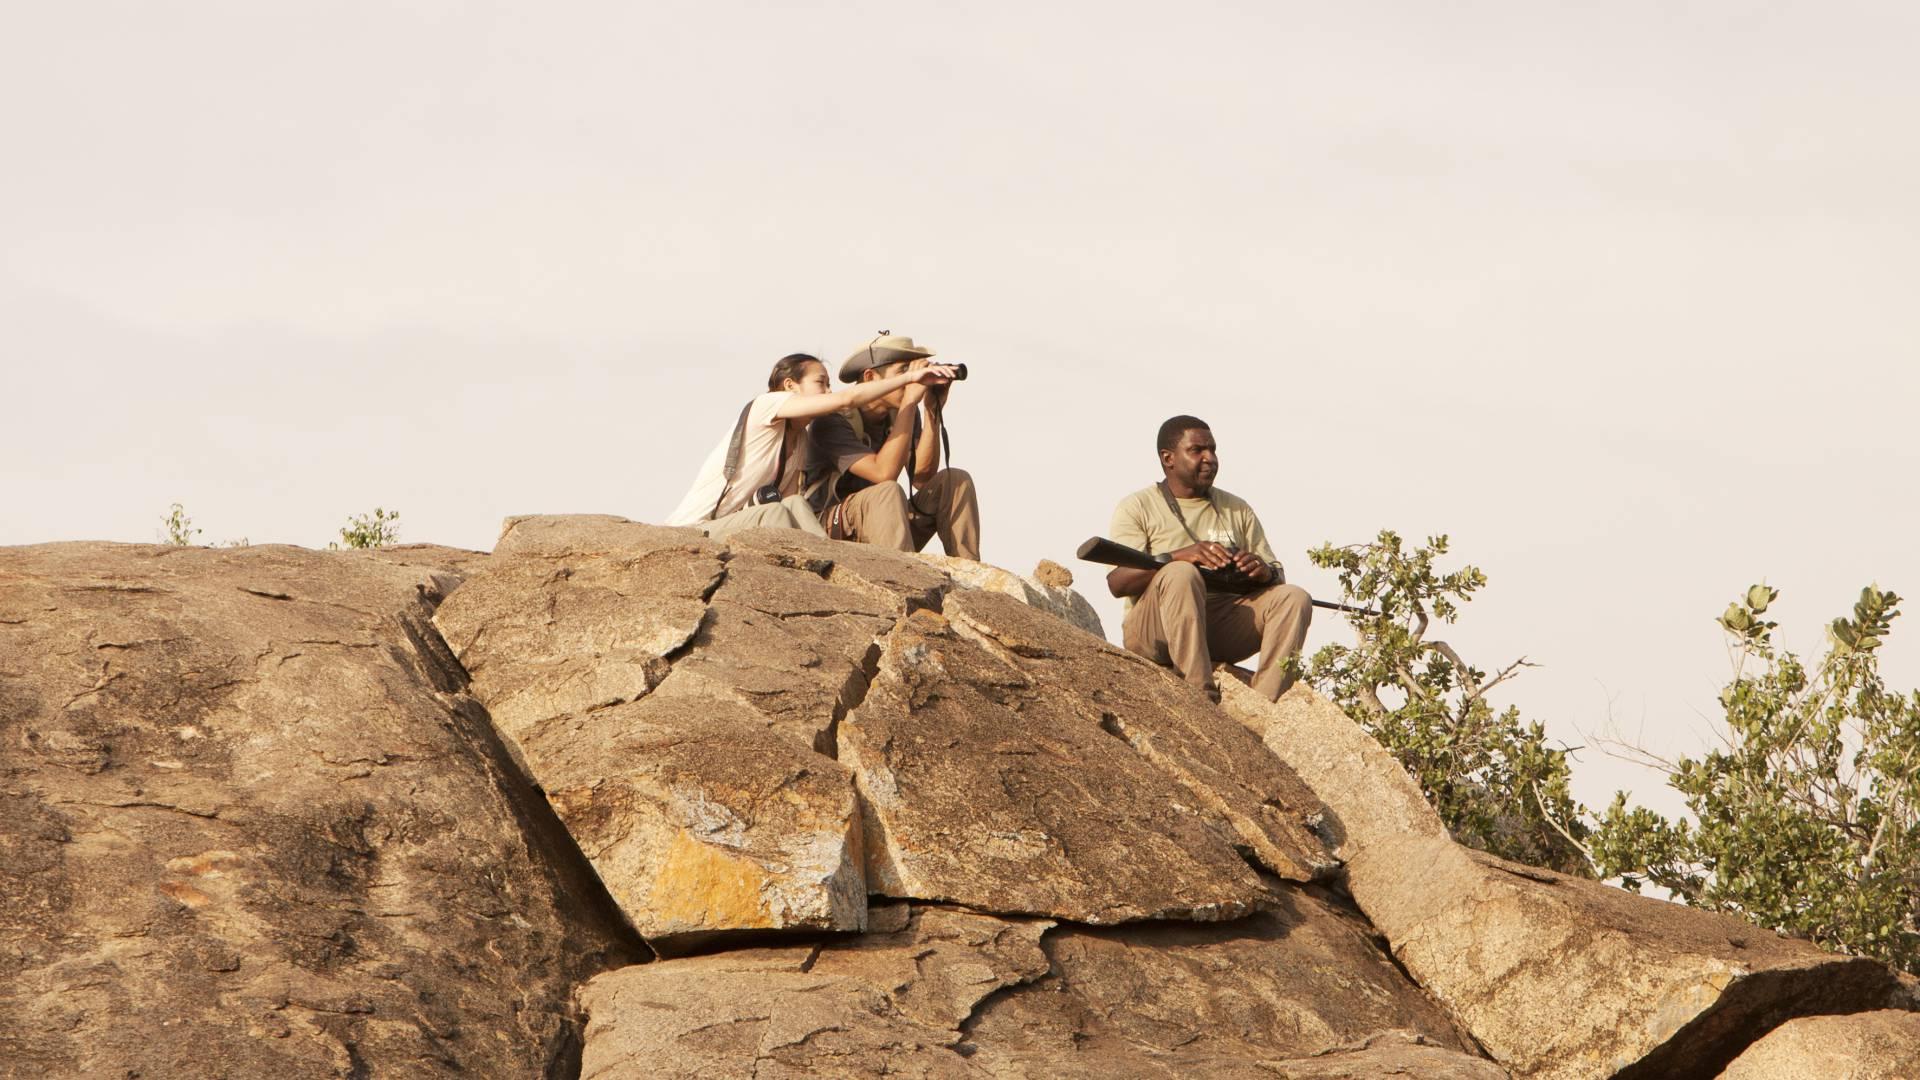 wayo afrika die wilderbeast migration folgen